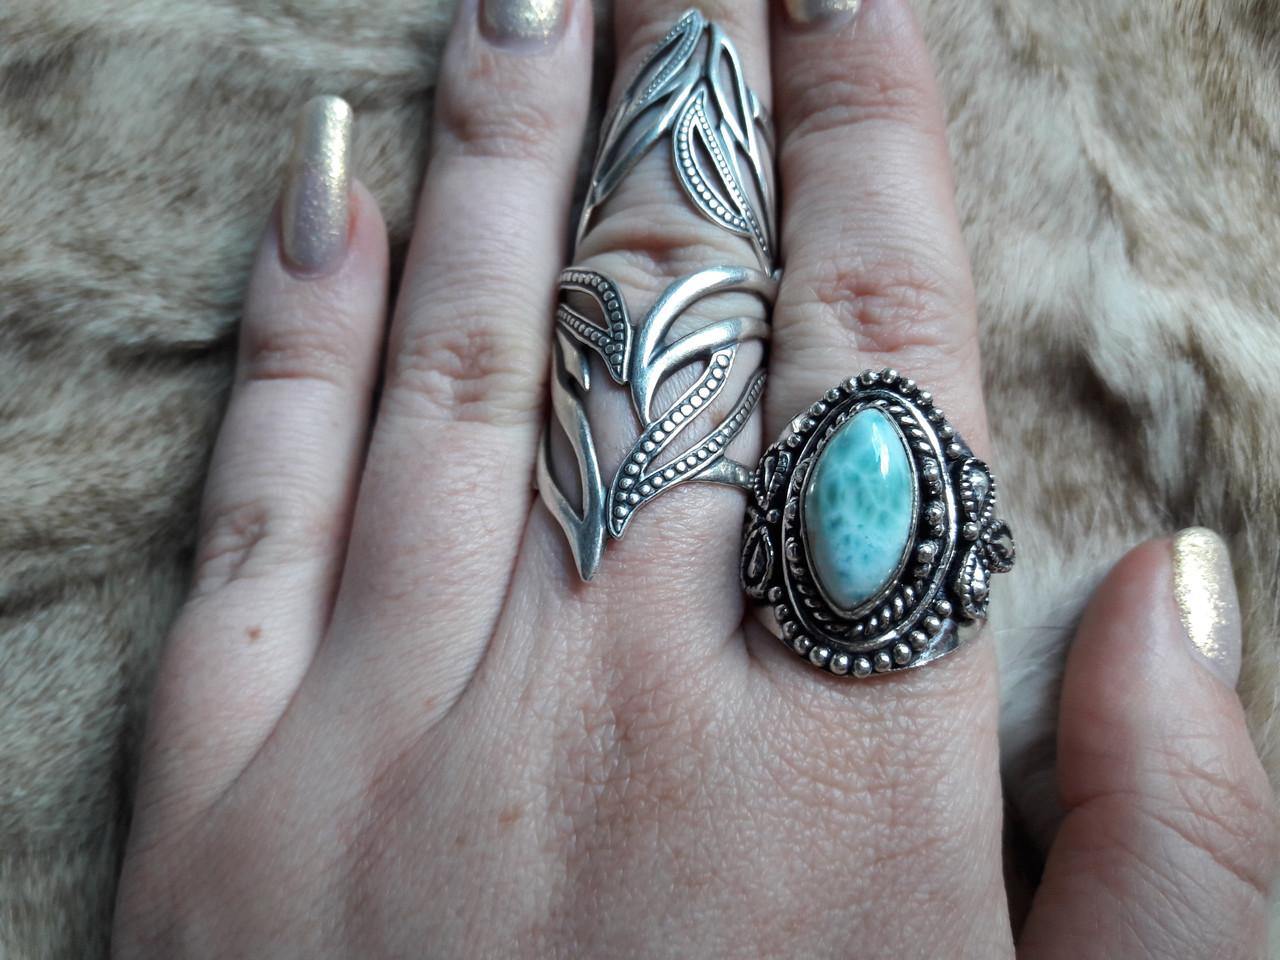 Ларимар кольцо с натуральным карибским ларимаром Доминикана. Размер 19,5. Эксклюзив!